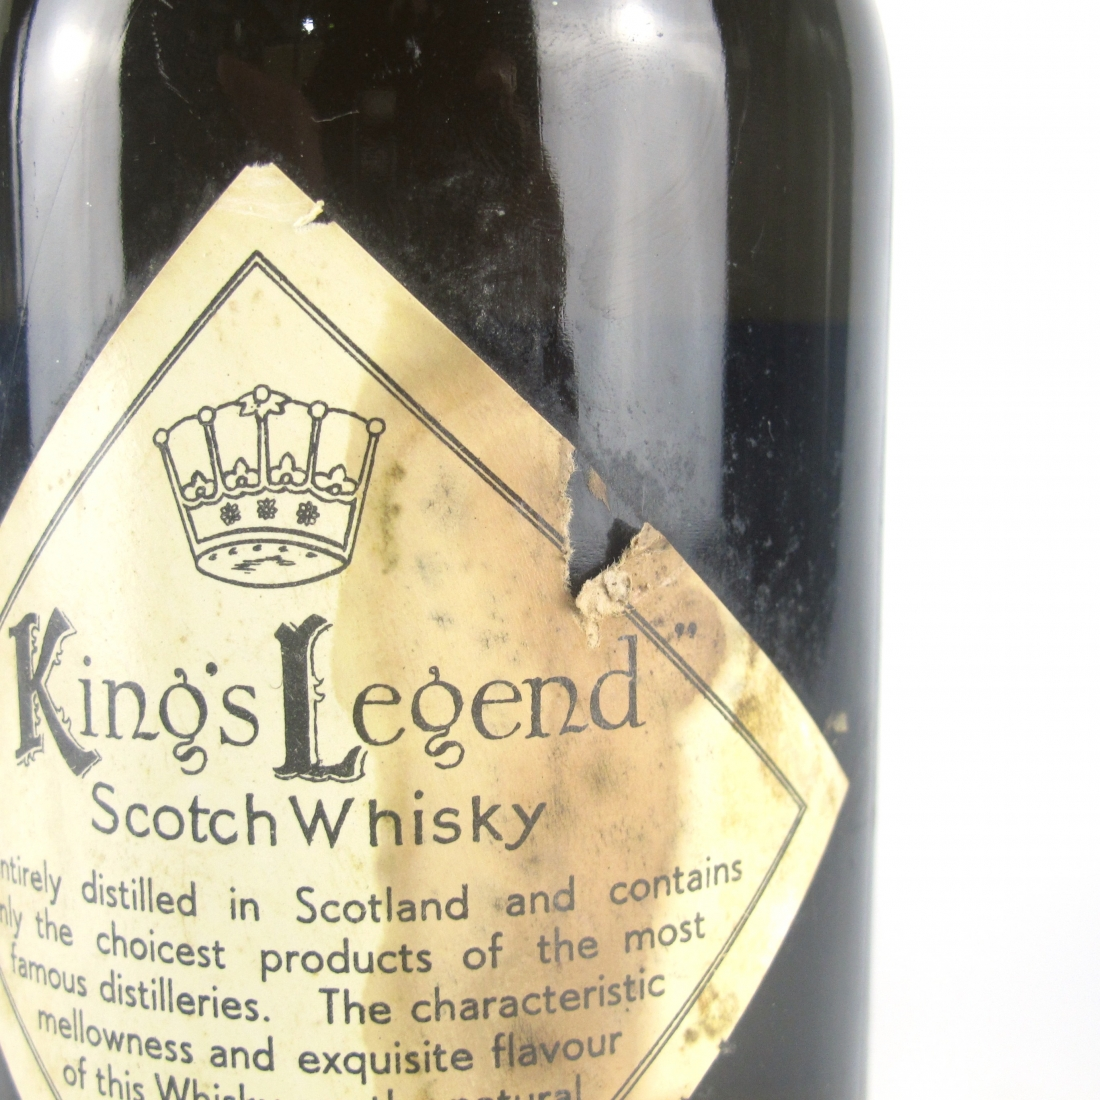 Ainslie's King's Legend Finest Scotch Whisky 1950s